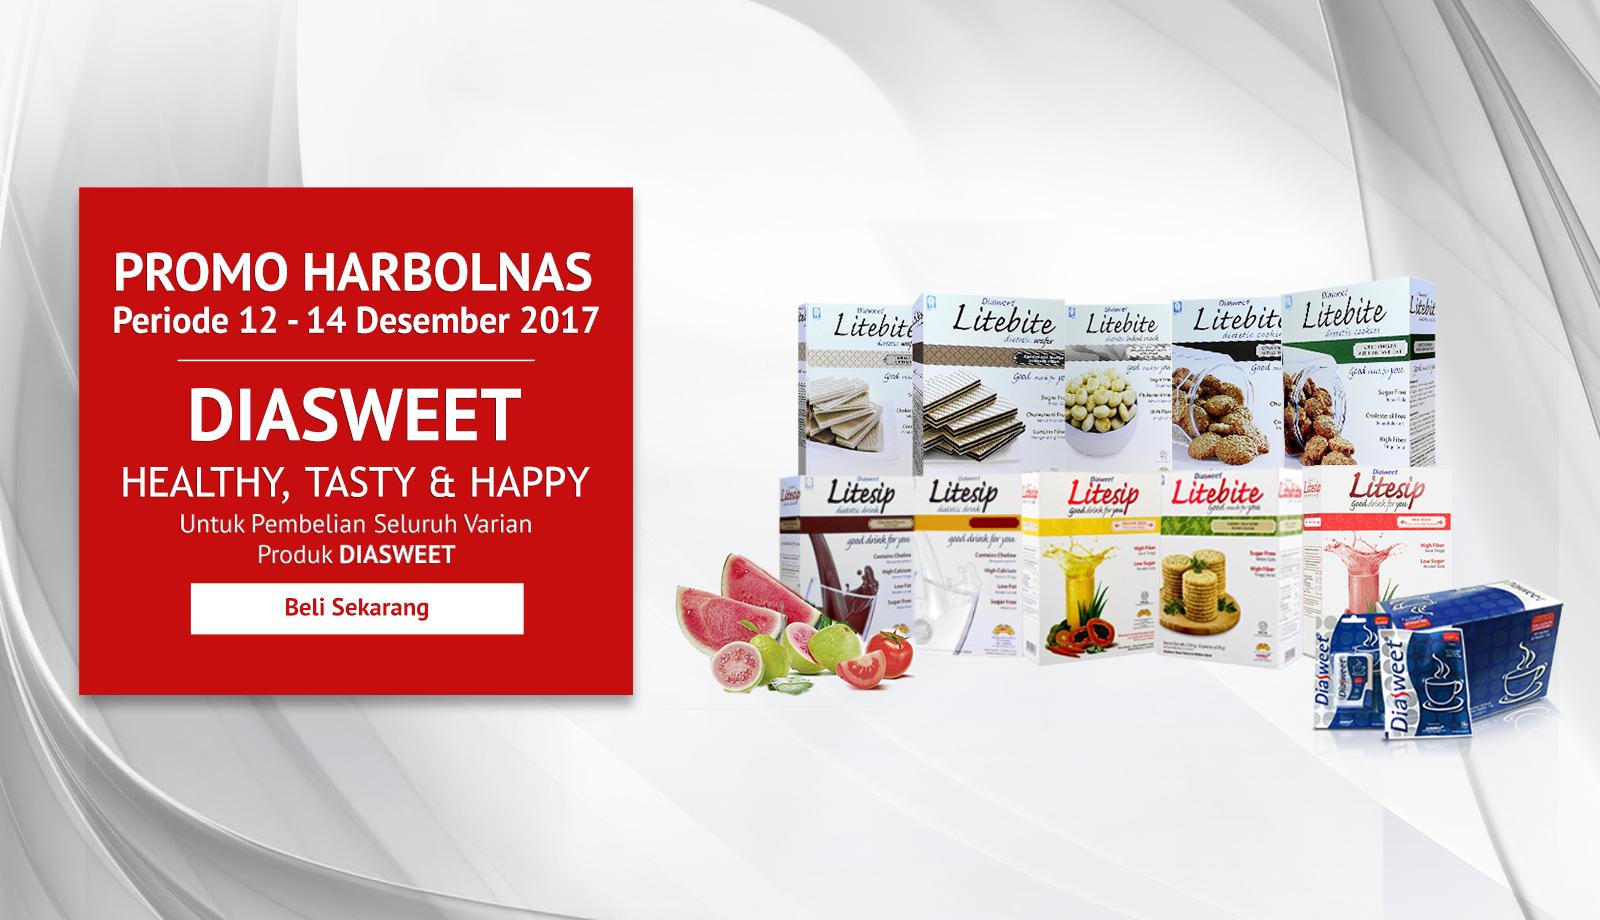 Diasweet Healthy - HARBOLNAS